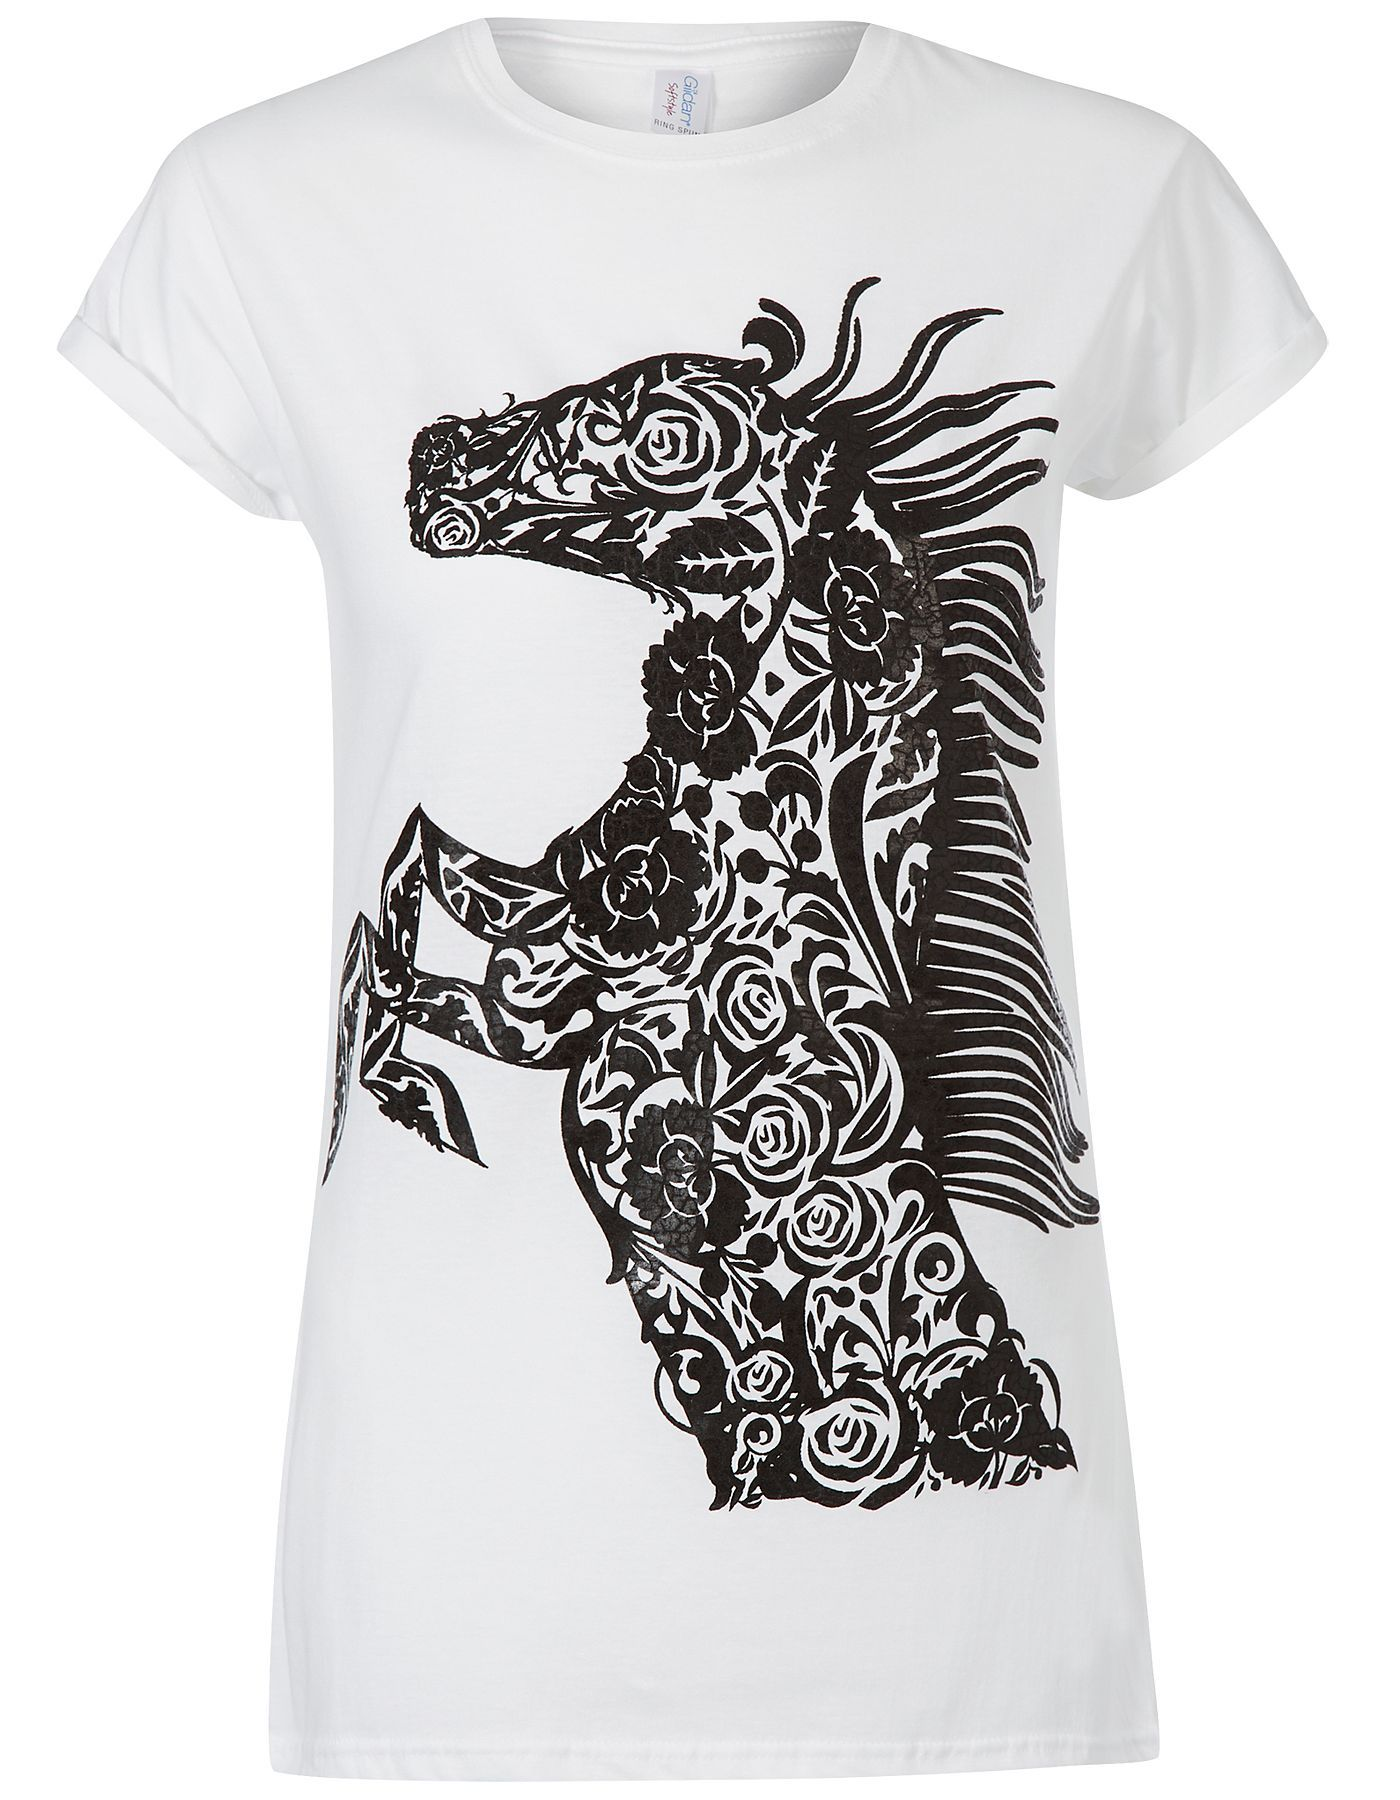 Black t shirt asda - Wet Look Horse Print T Shirt Women George At Asda